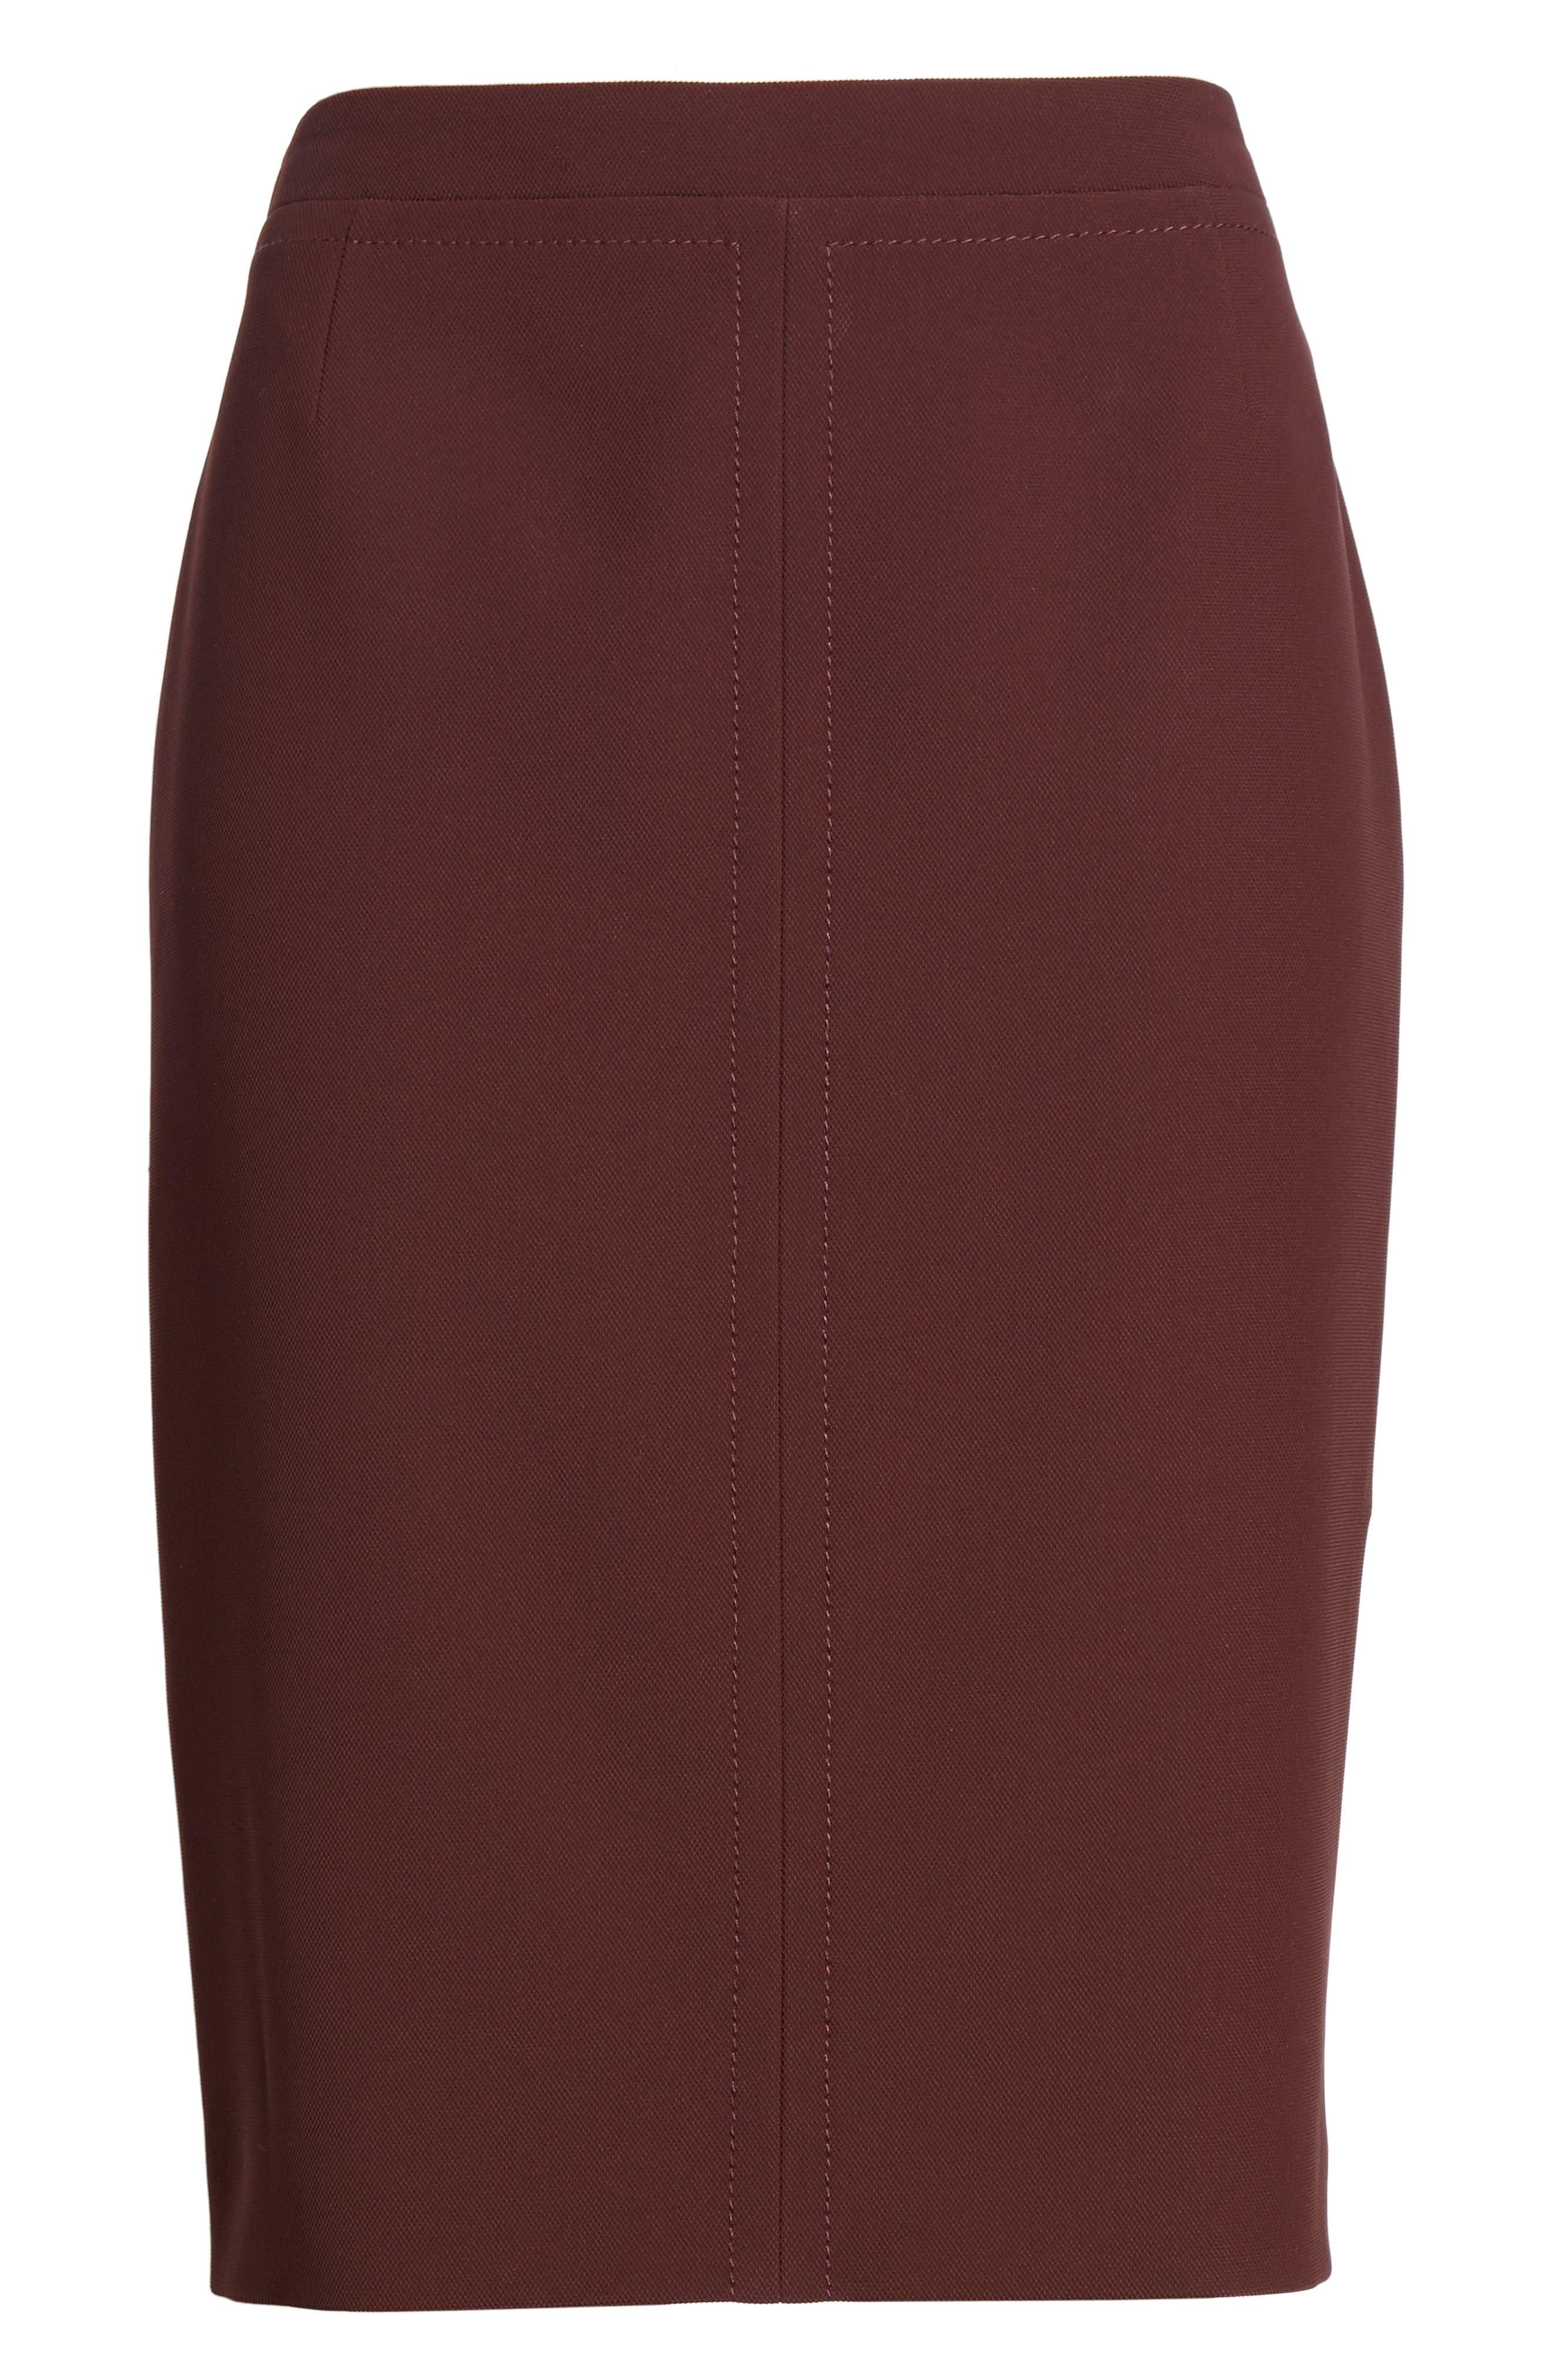 Vuriona Suit Skirt,                             Alternate thumbnail 6, color,                             Mulberry